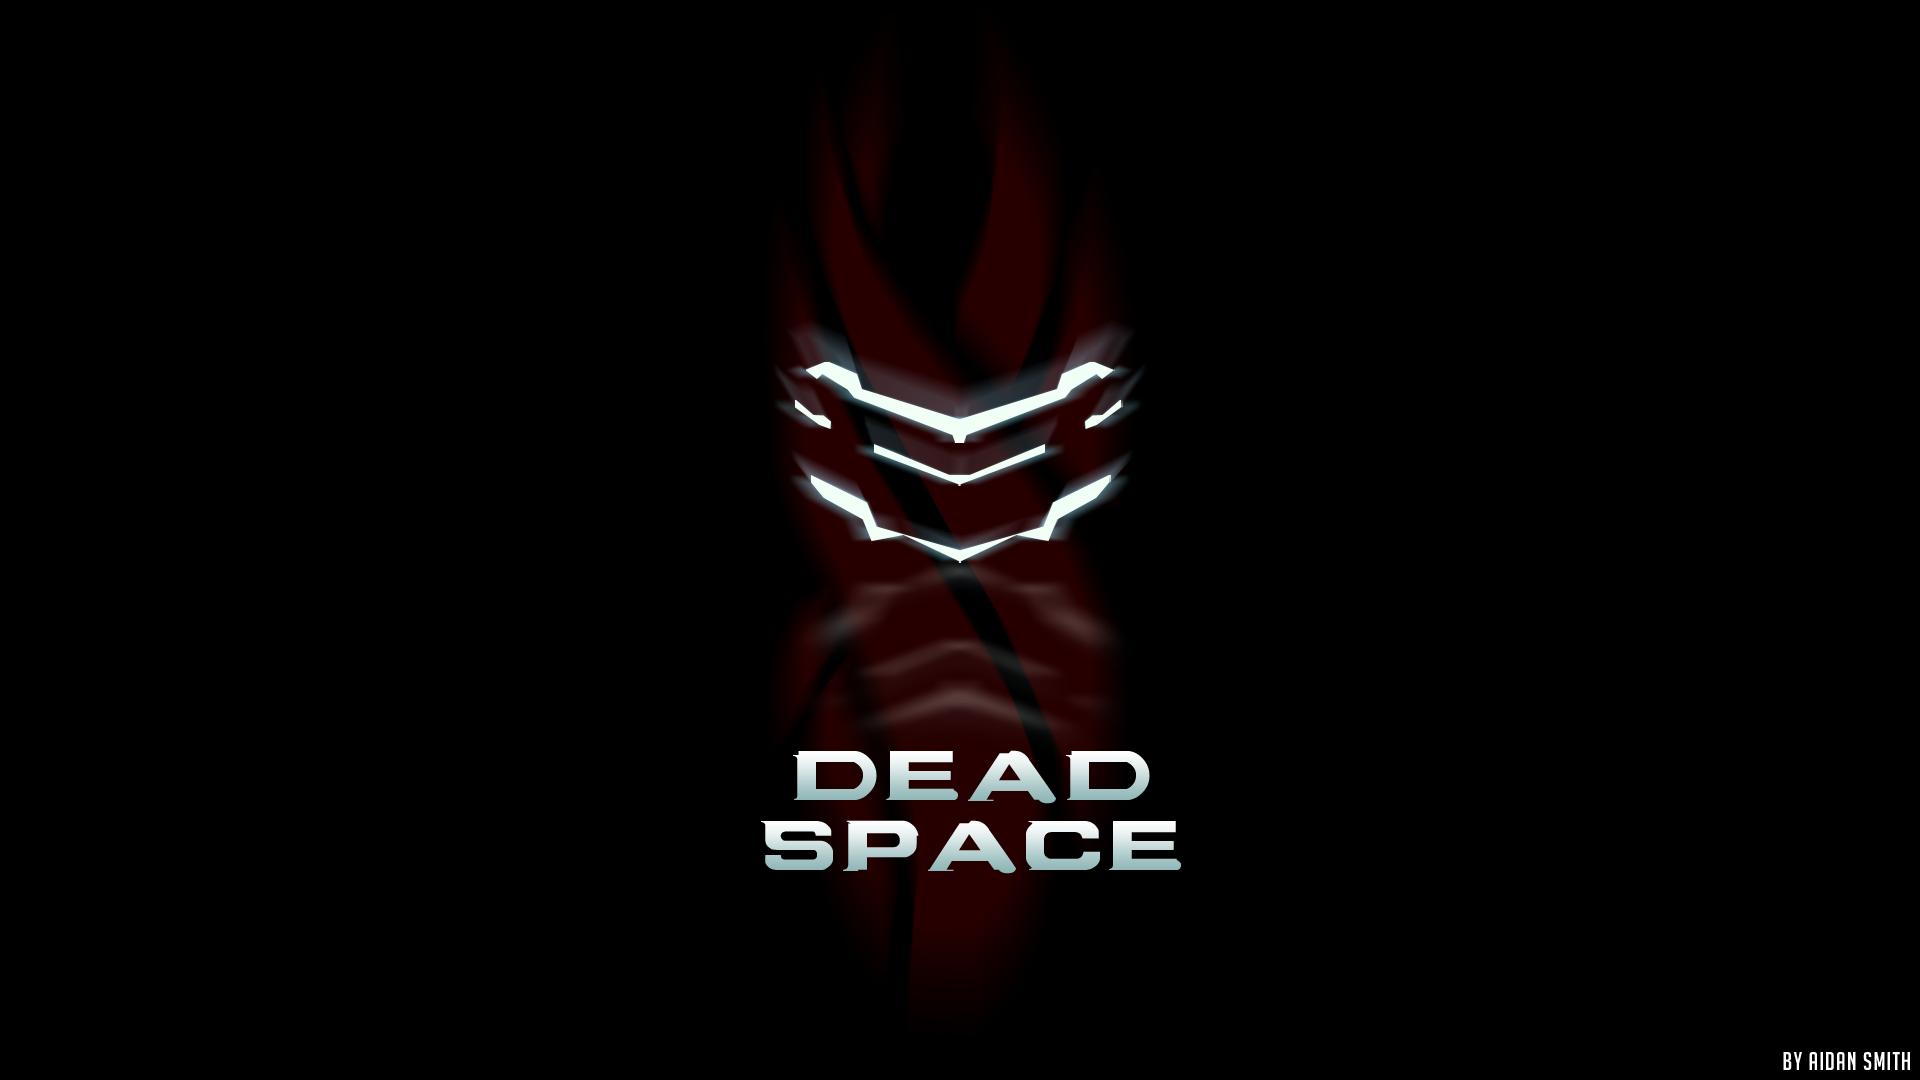 Dead Space HD Wallpapers Backgrounds Wallpaper Wallpapers 4k